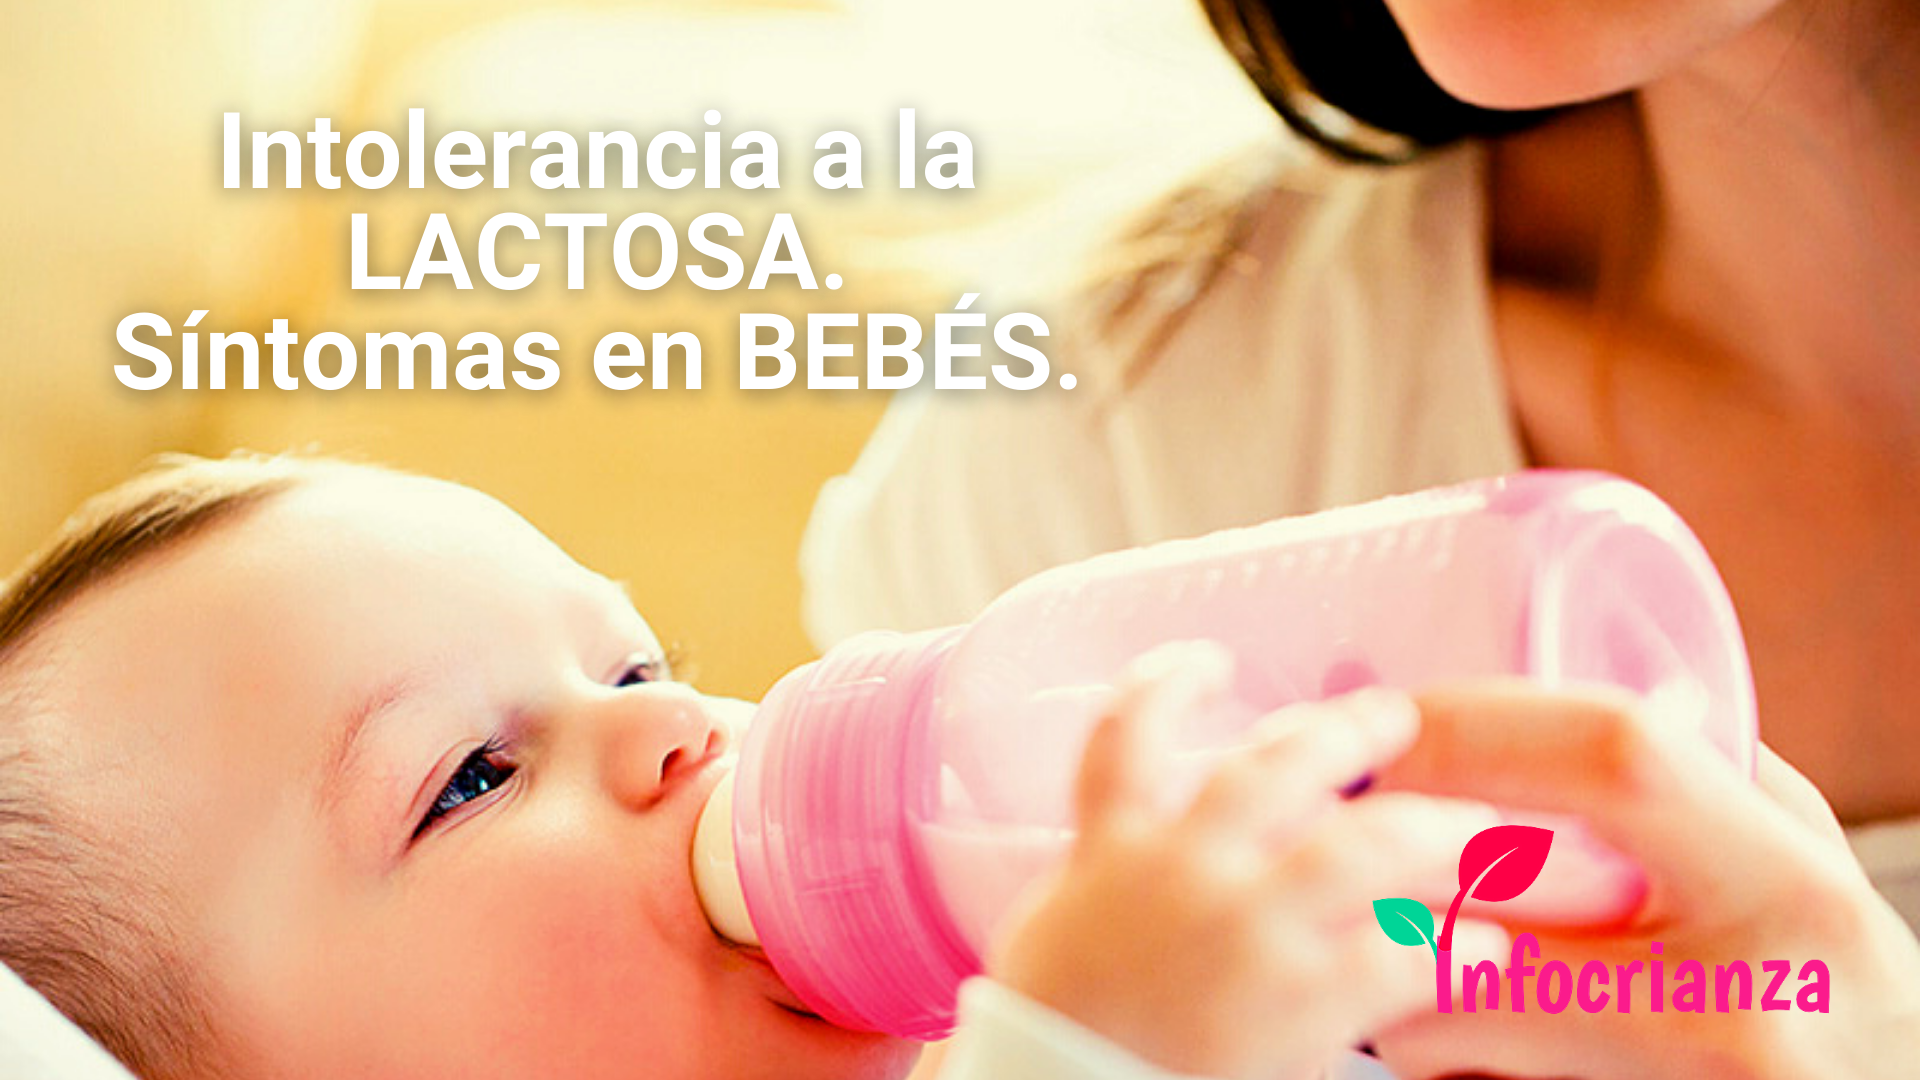 Intolerancia a la lactosa; Síntomas comunes en bebés